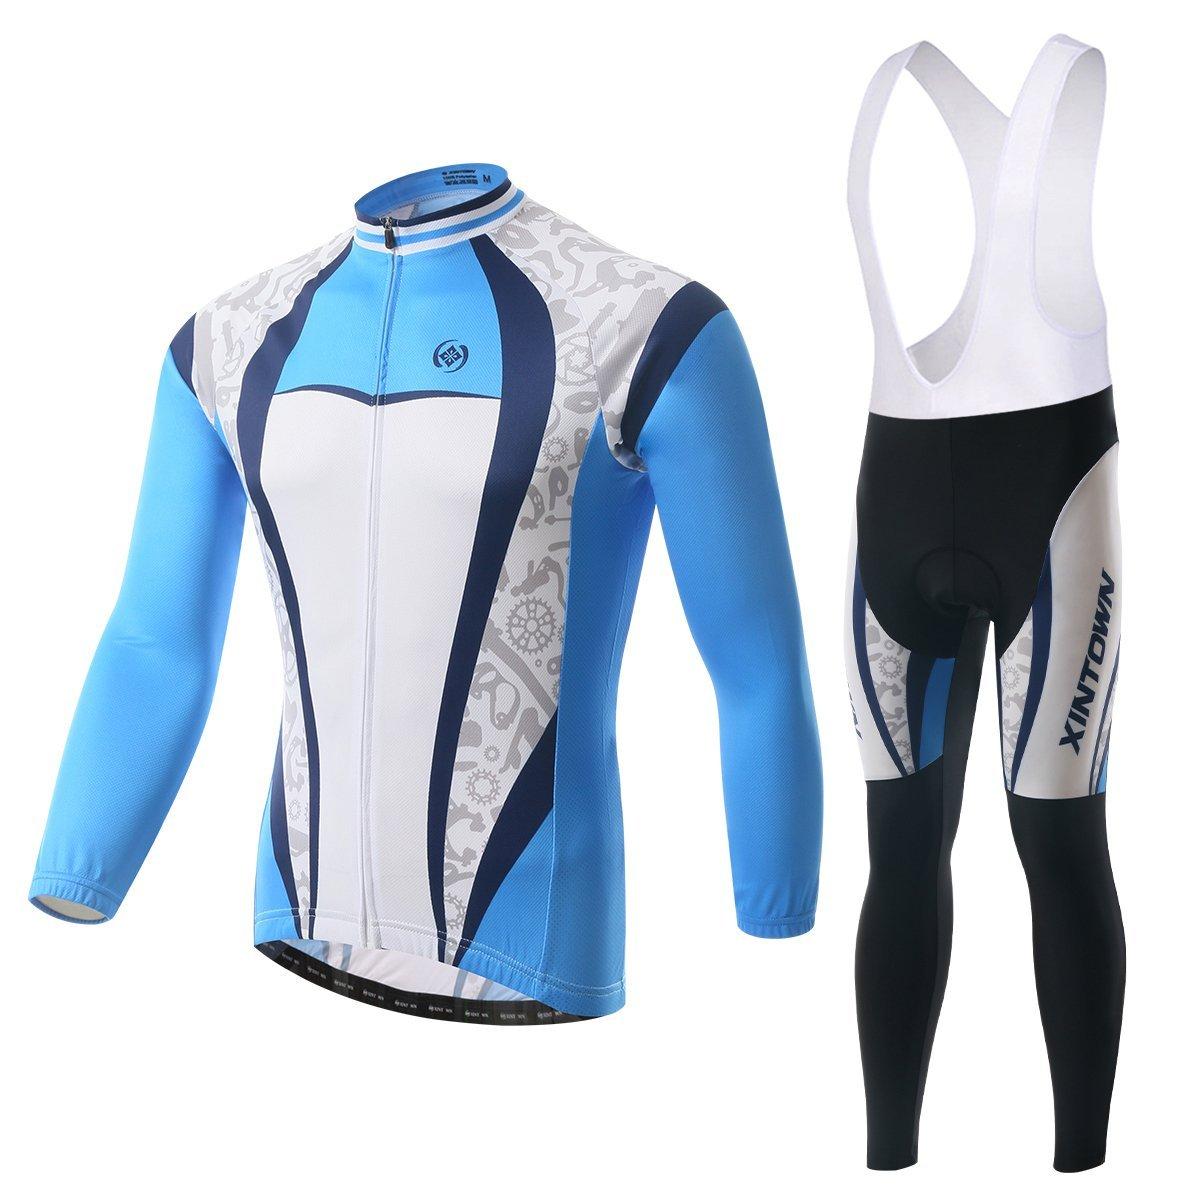 besylユニセックスPrintedハイパフォーマンスメッシュサイクリング服スーツ、通気性長袖サイクリングジャージーとよだれかけのパッド入りパンツキット自転車自転車乗馬Biker (ブルー濃い青色ホワイトグレー) B018G5YU1K XXL (US XL)|Fleece-Bib-Long-Set Fleece-Bib-Long-Set XXL (US XL)